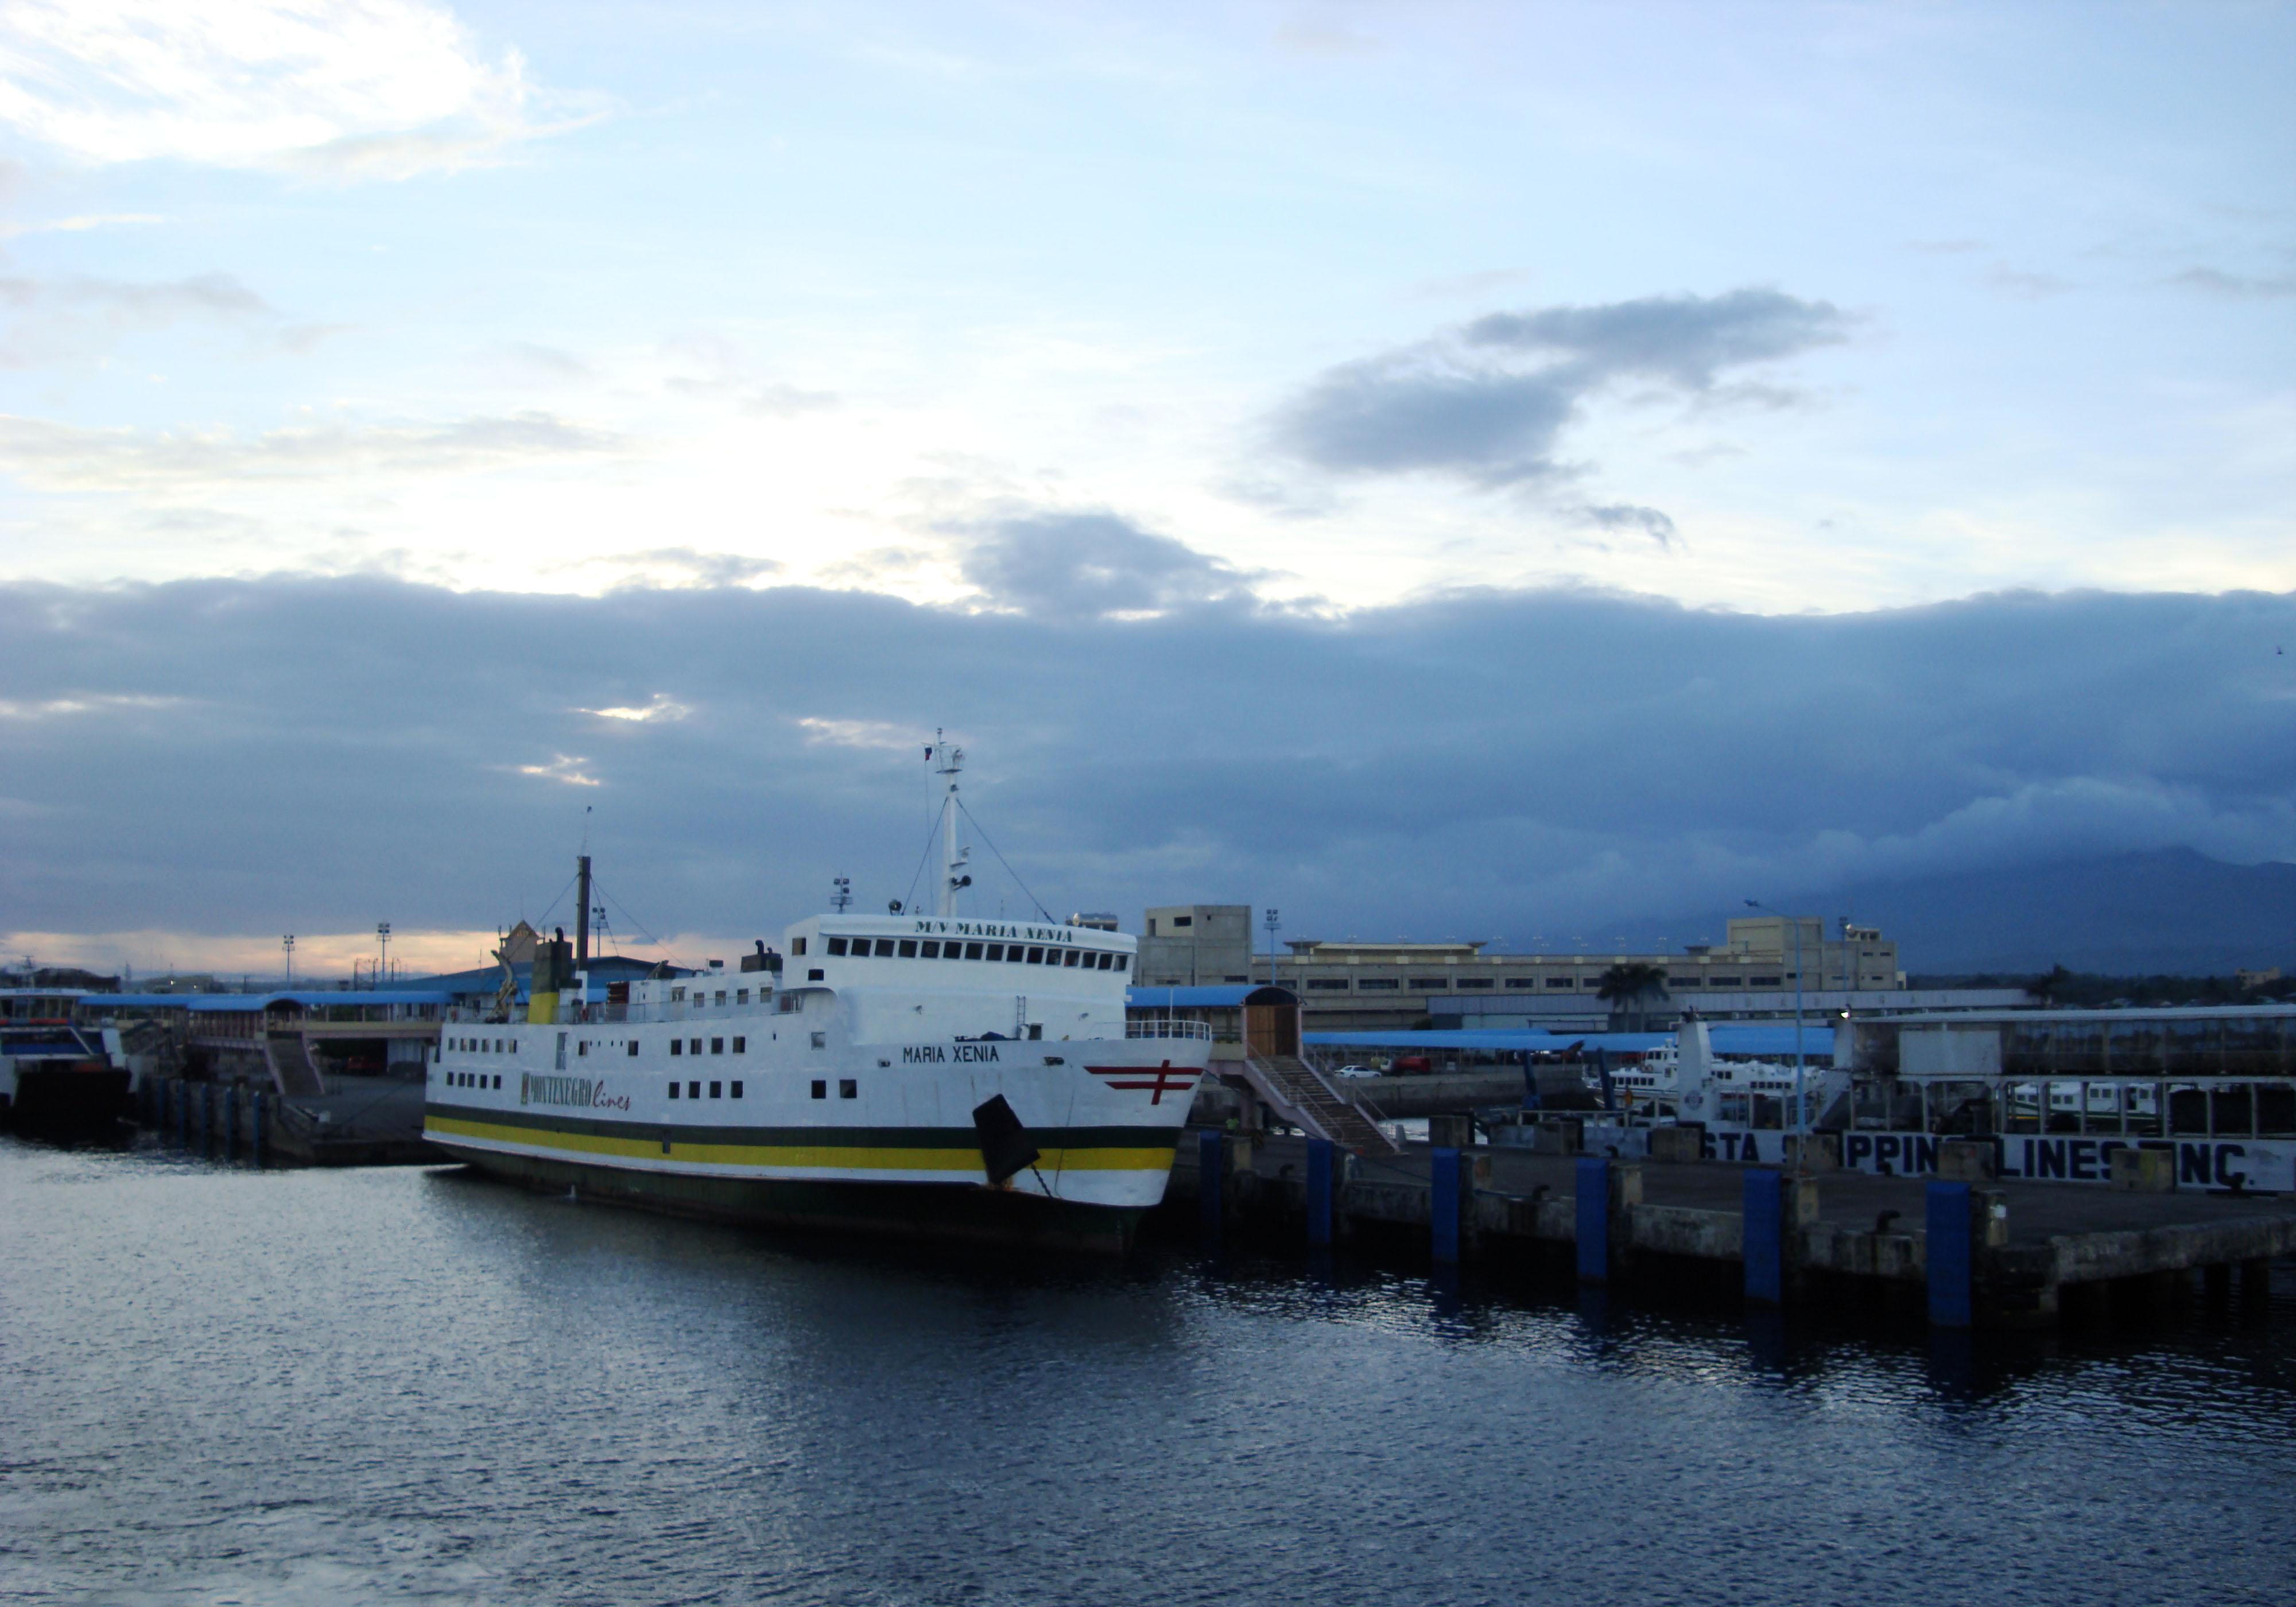 MV Maria Xenia car ferry Montenegro lines Batangas Pier Philippines 01